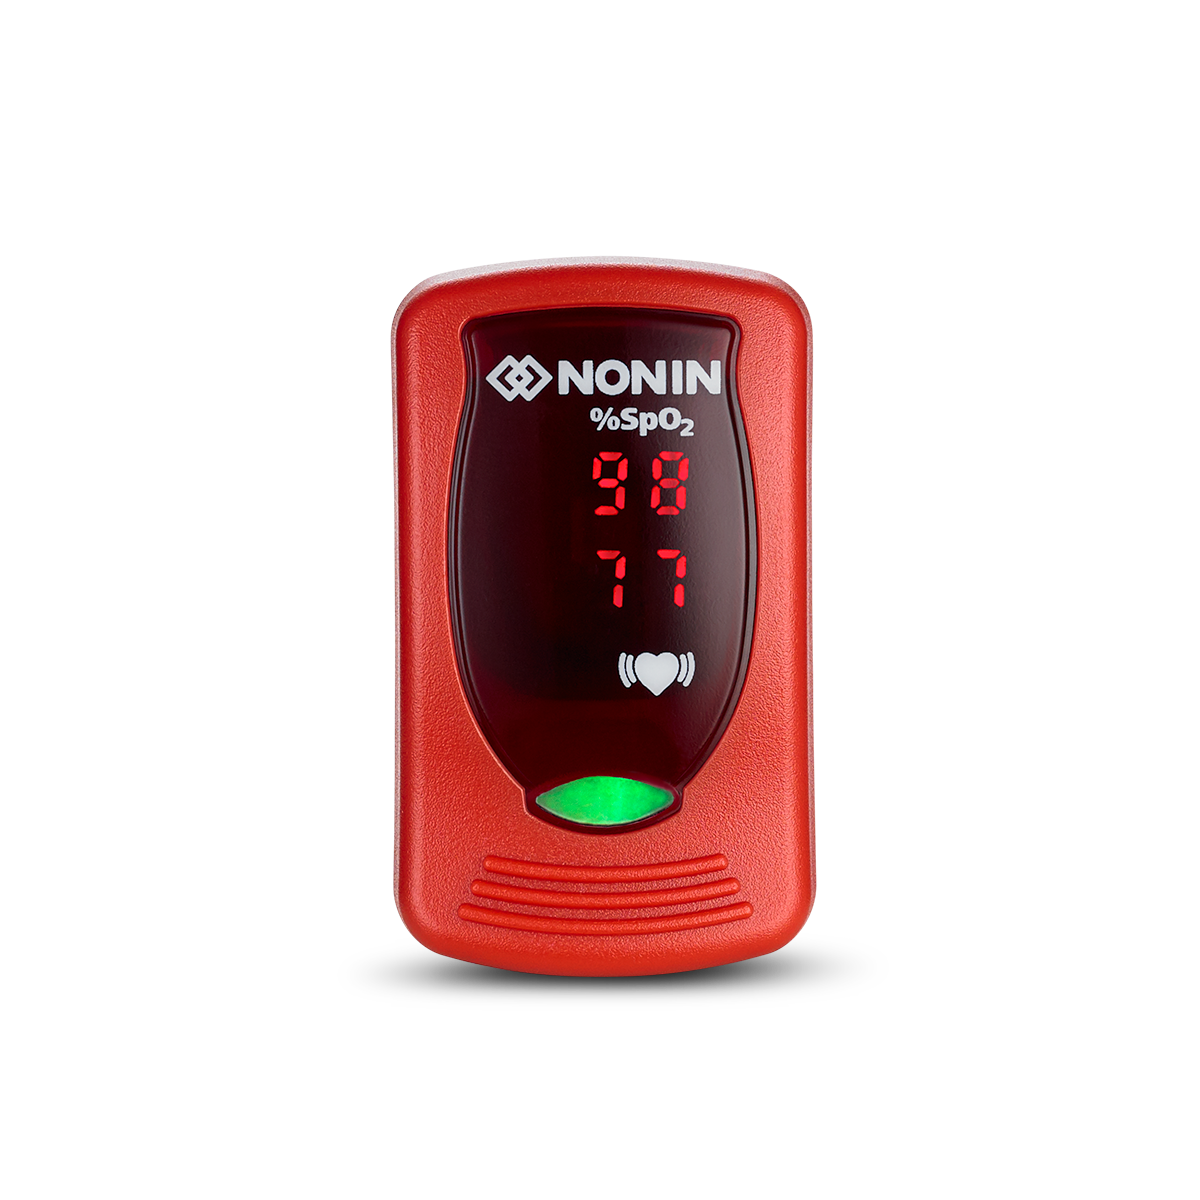 NONIN 9590 VANTAGE